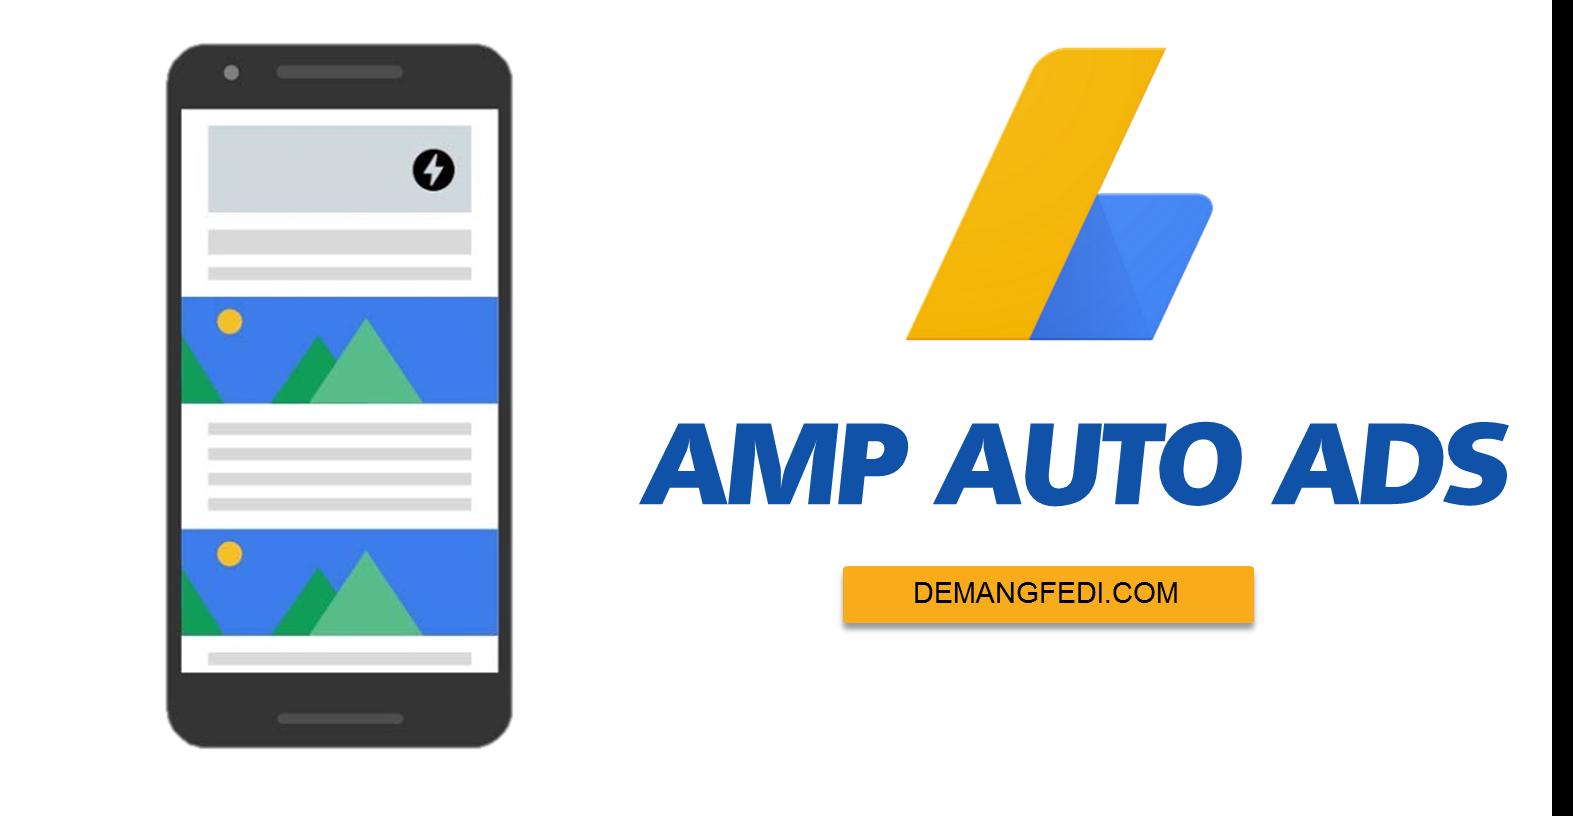 Cara Memasang Iklan Auto Ads Adsense Untuk Blog AMP